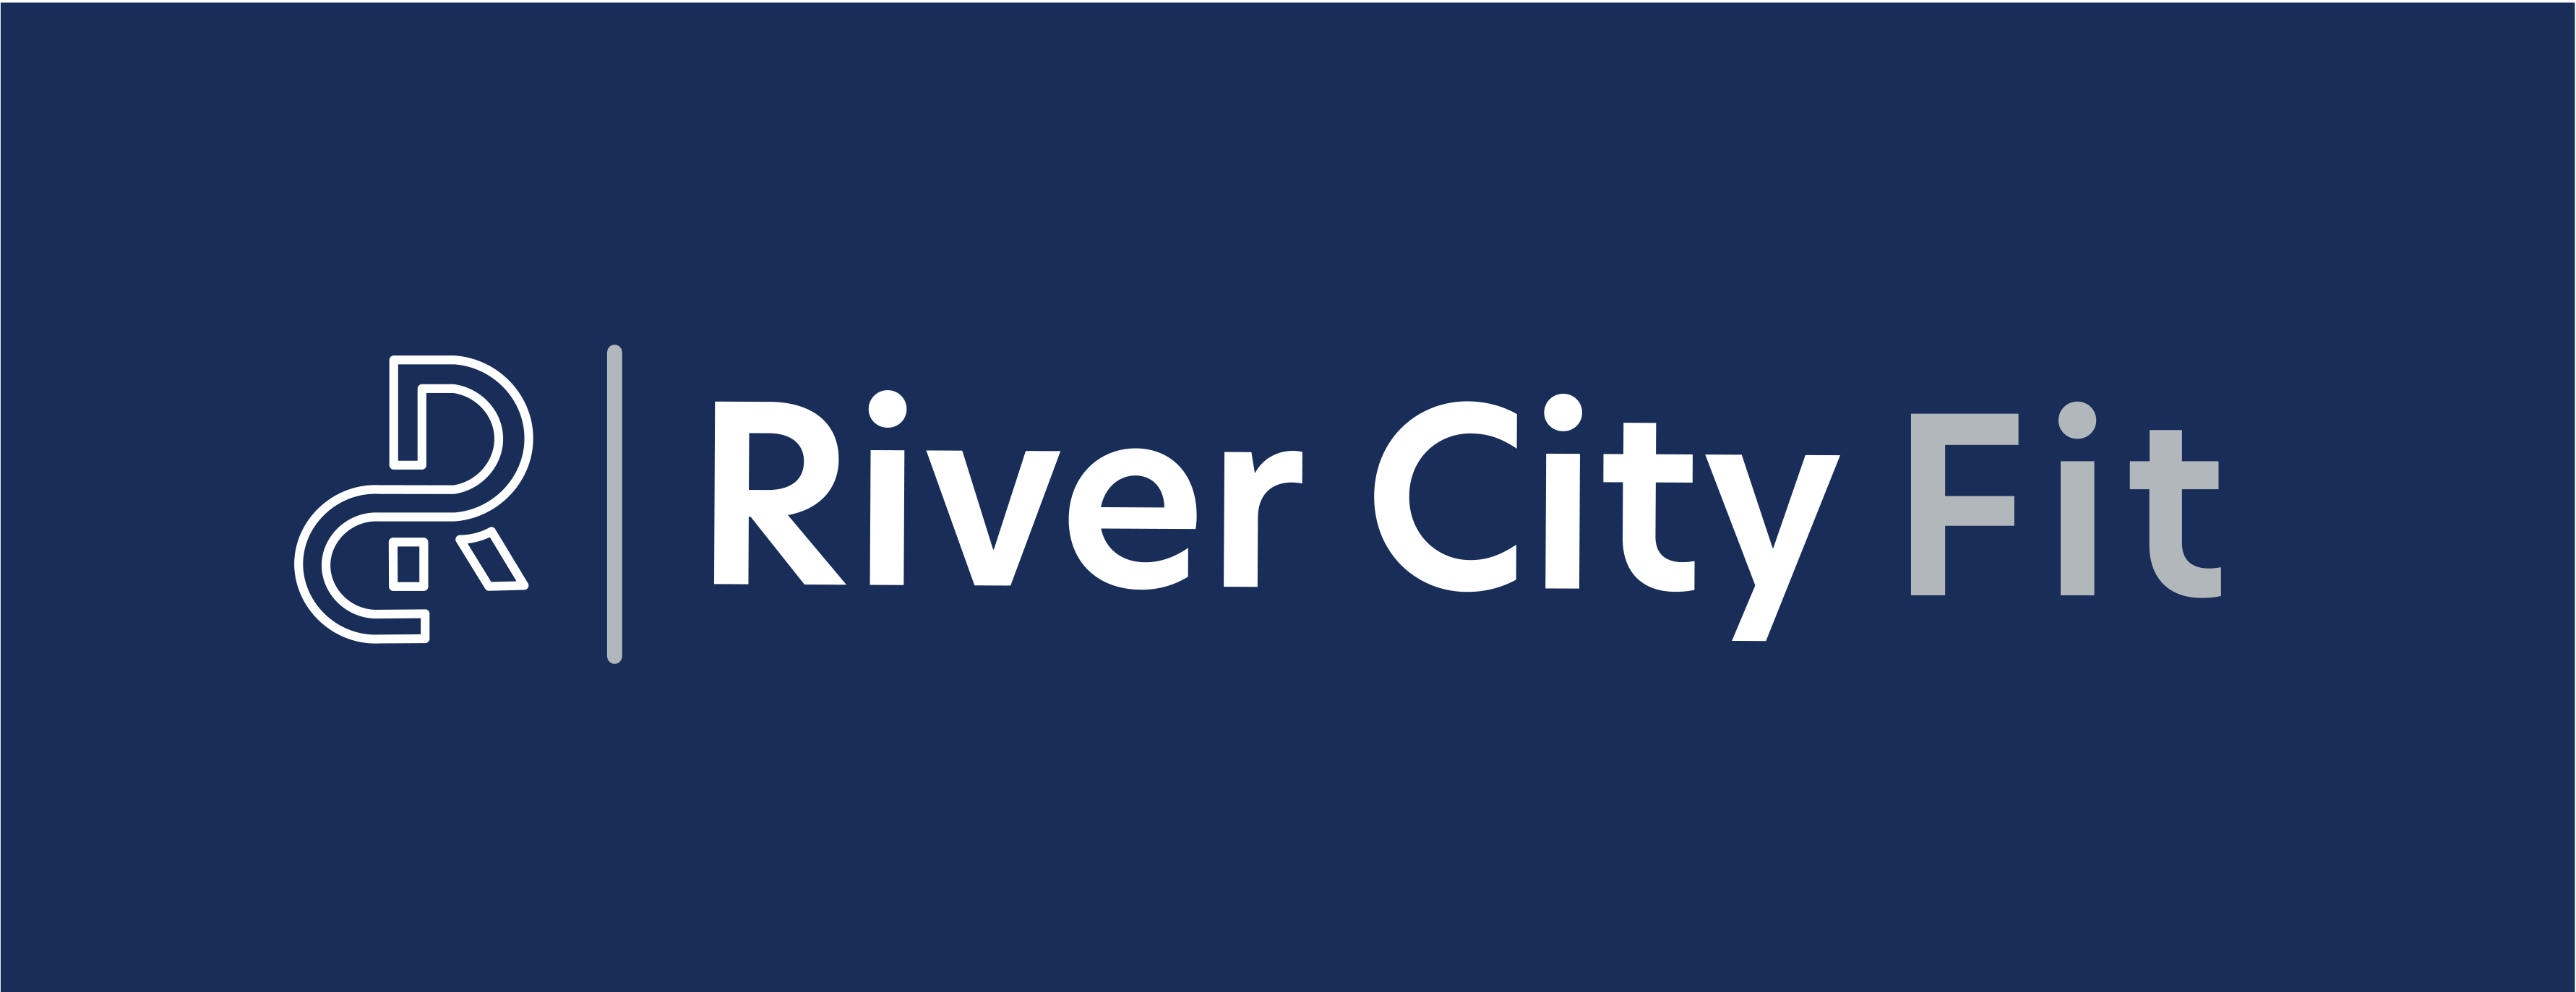 River City Fit logo